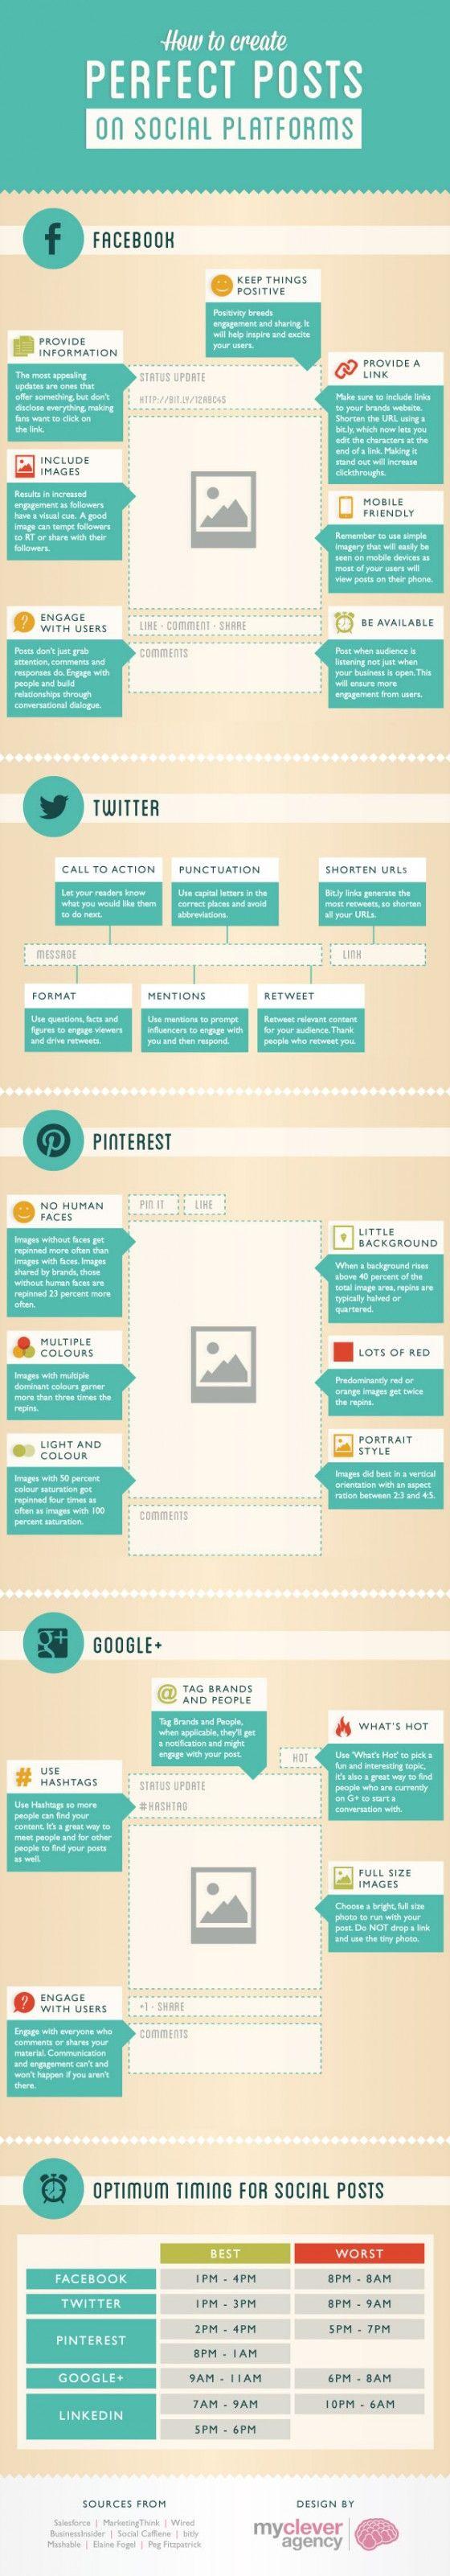 perfect posts on social platforms Facebook, Twitter, Pinterest et Google+ ?